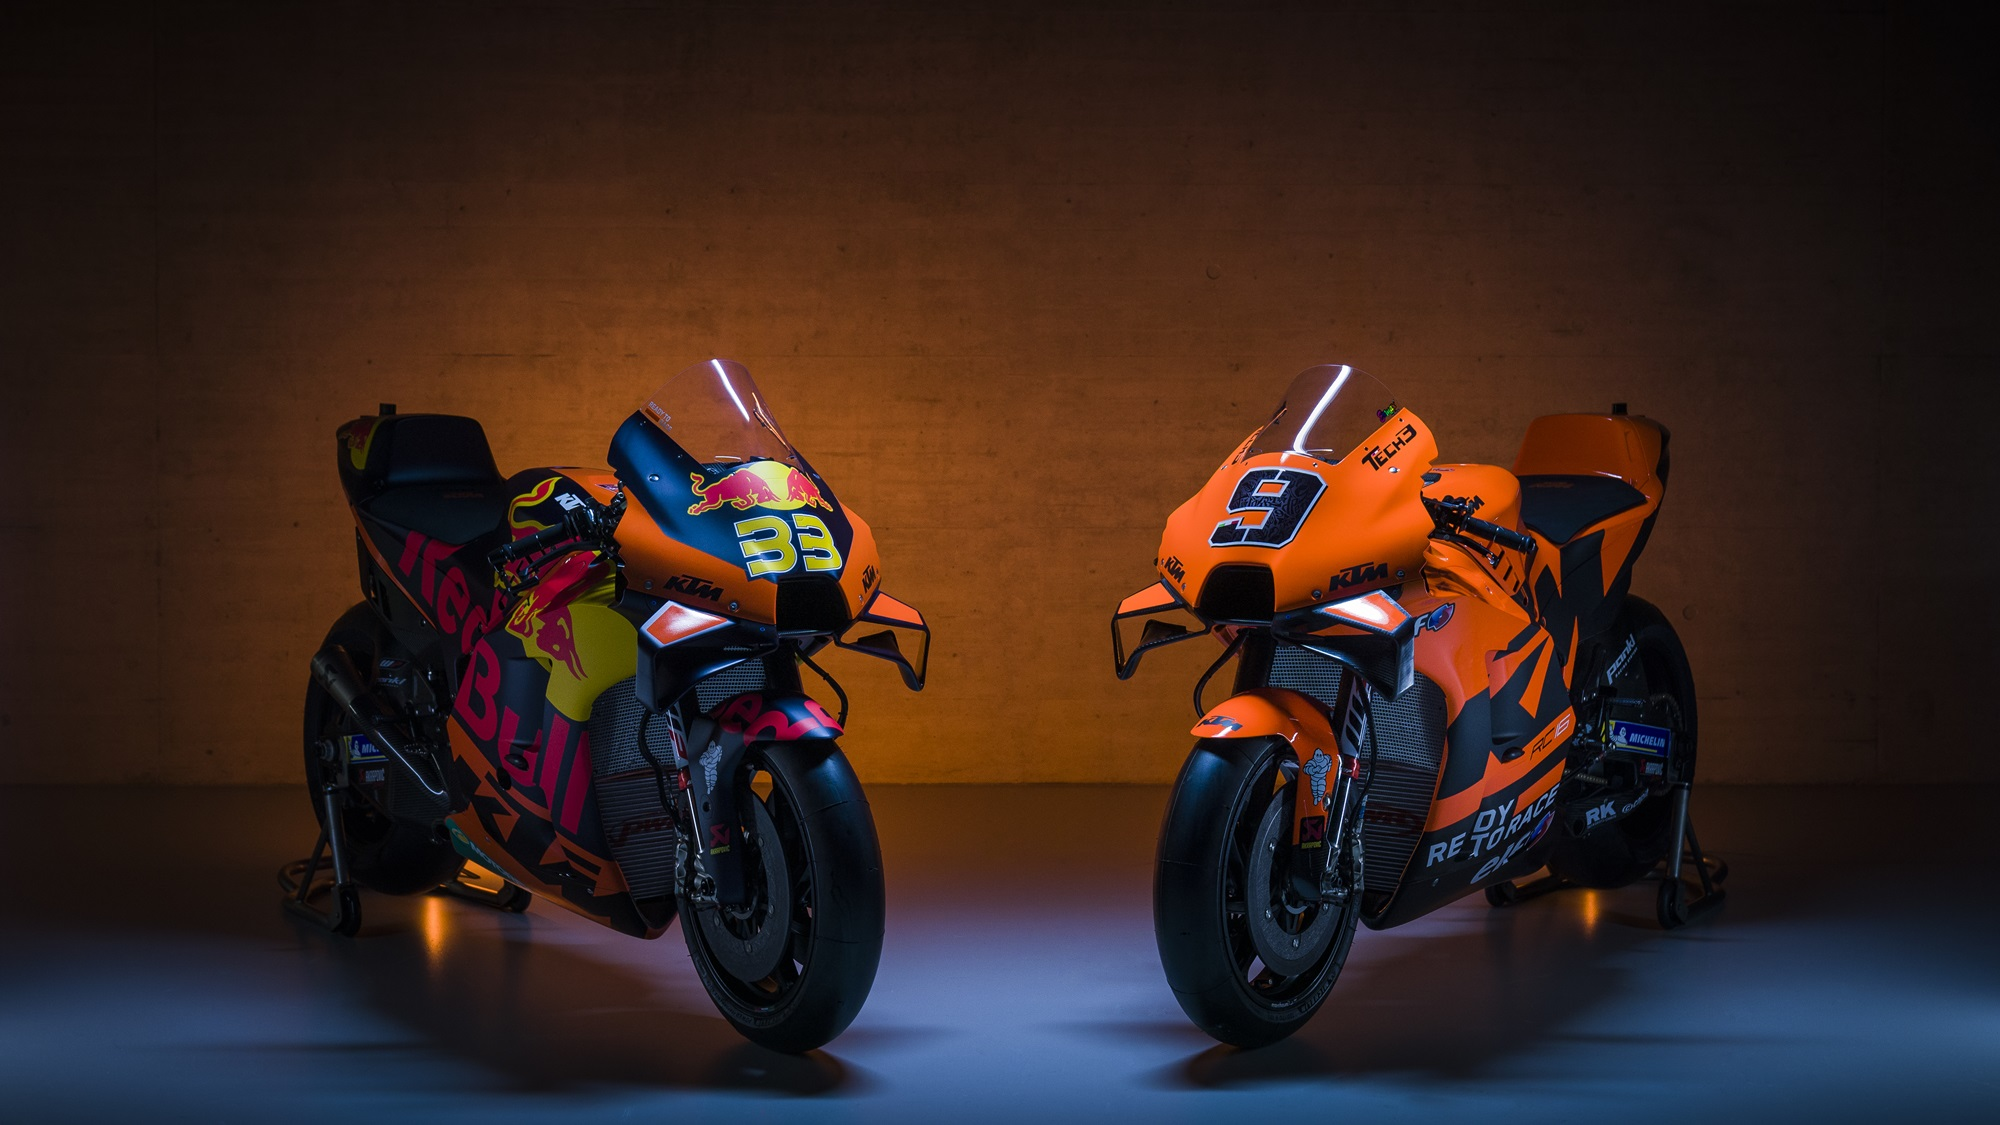 KTM MotoGP HD wallpaper